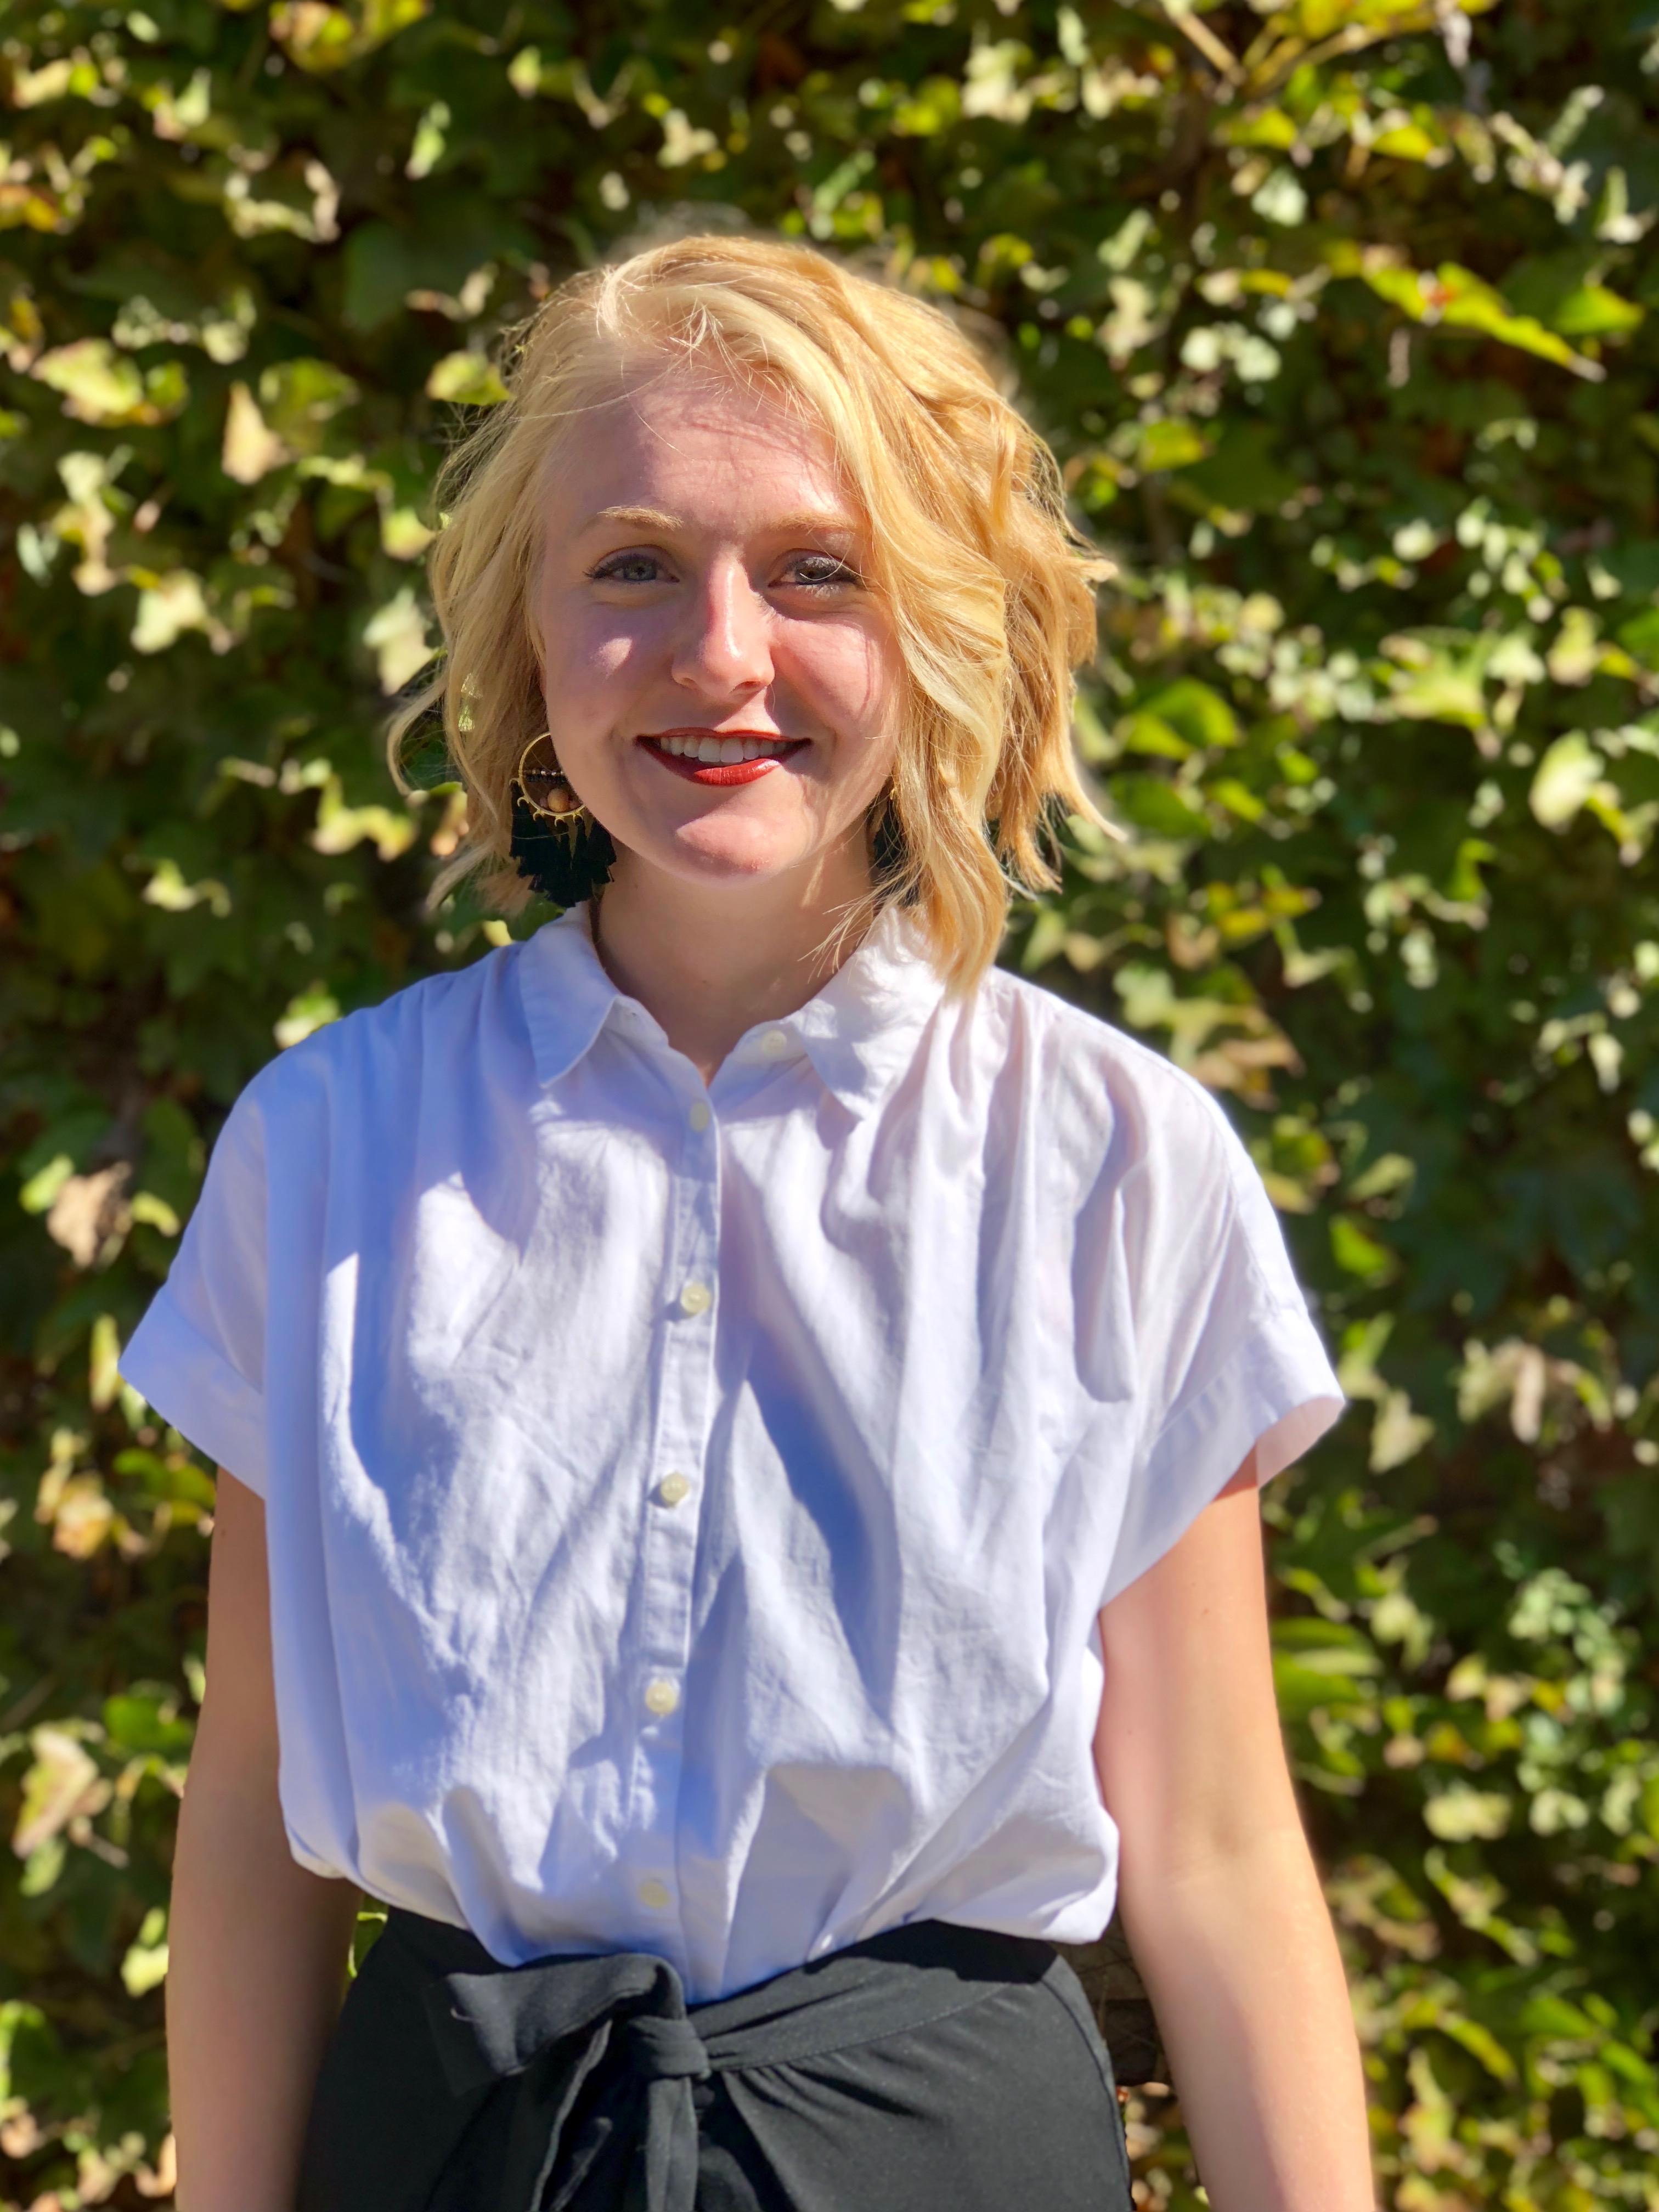 Olivia Feathers, Former Graphic Design Intern at Novella Brandhouse